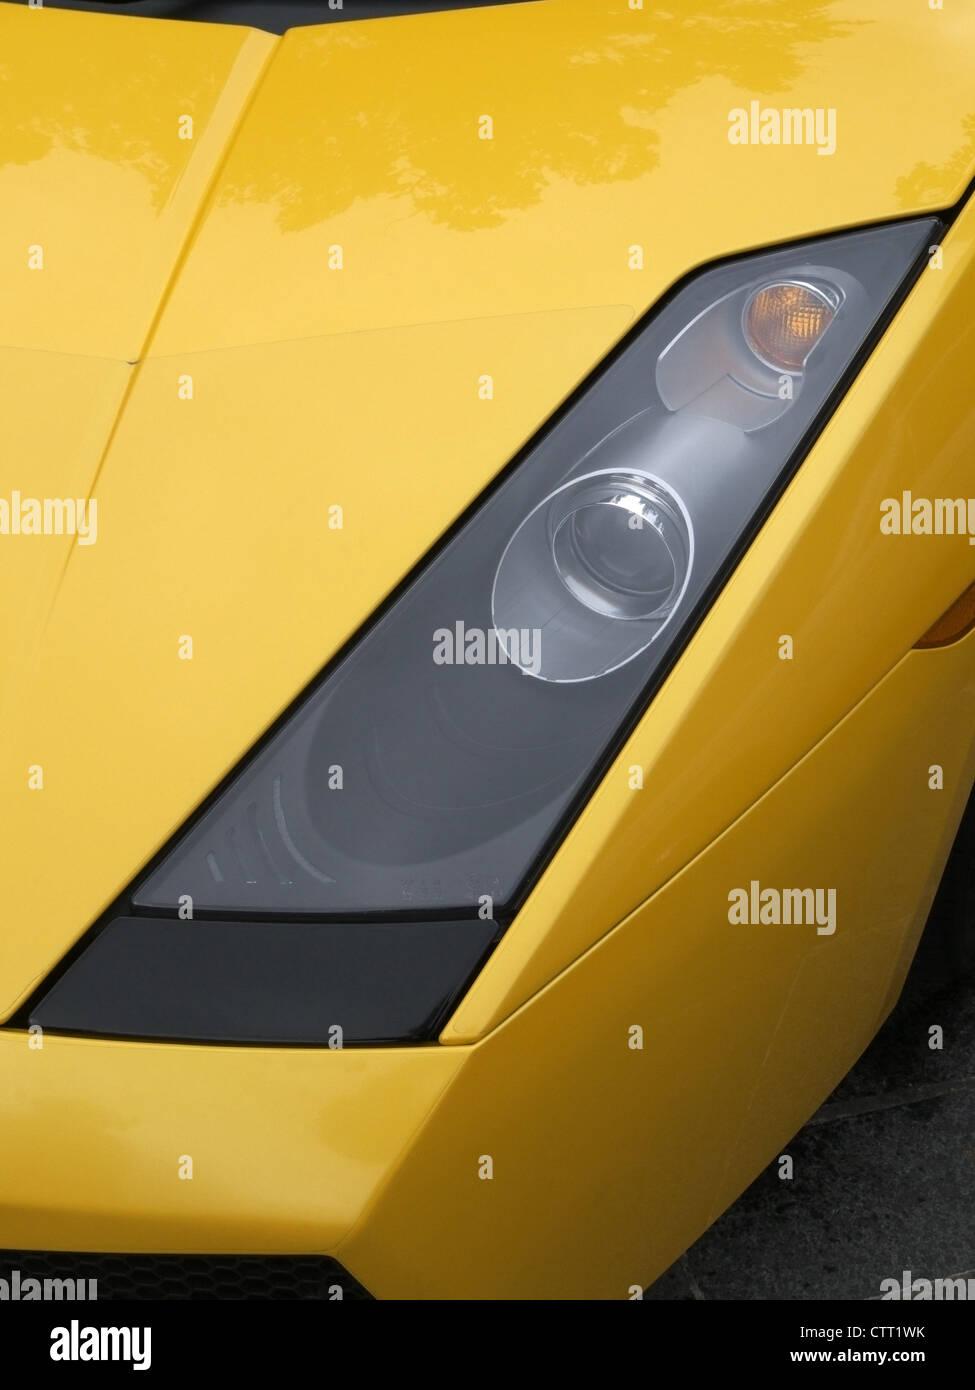 Lamborghini Gallardo Stock Photos Lamborghini Gallardo Stock